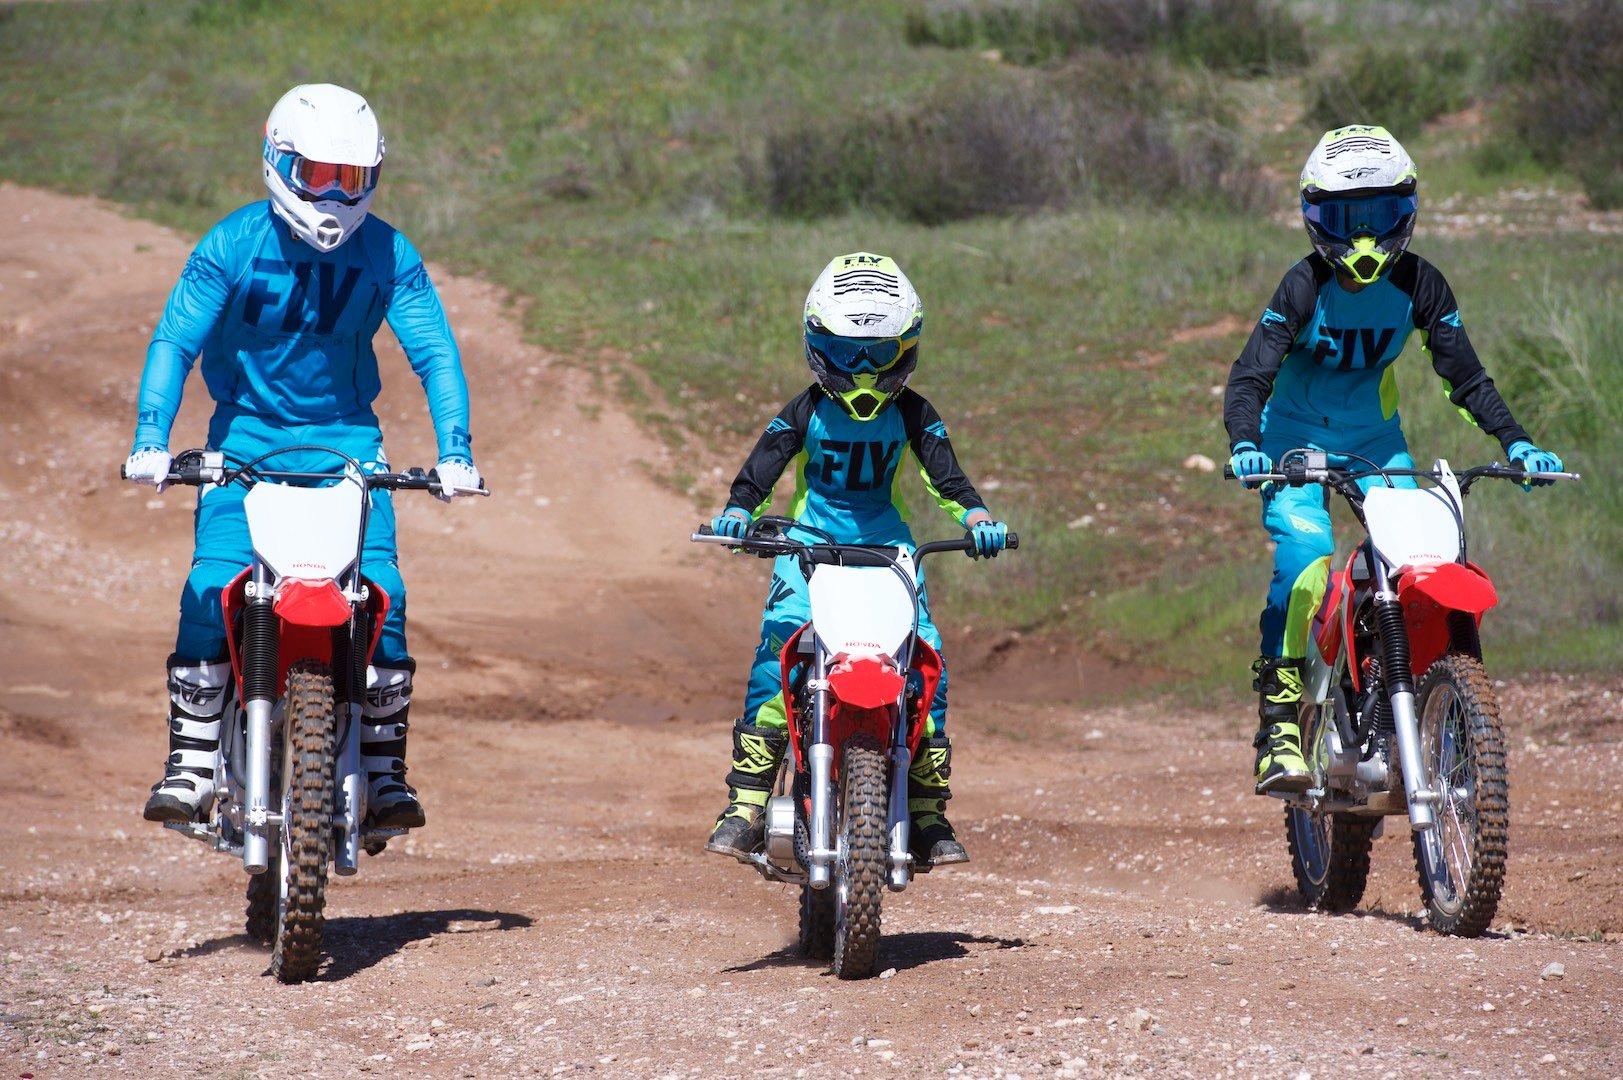 Honda CRF family of motorcycles